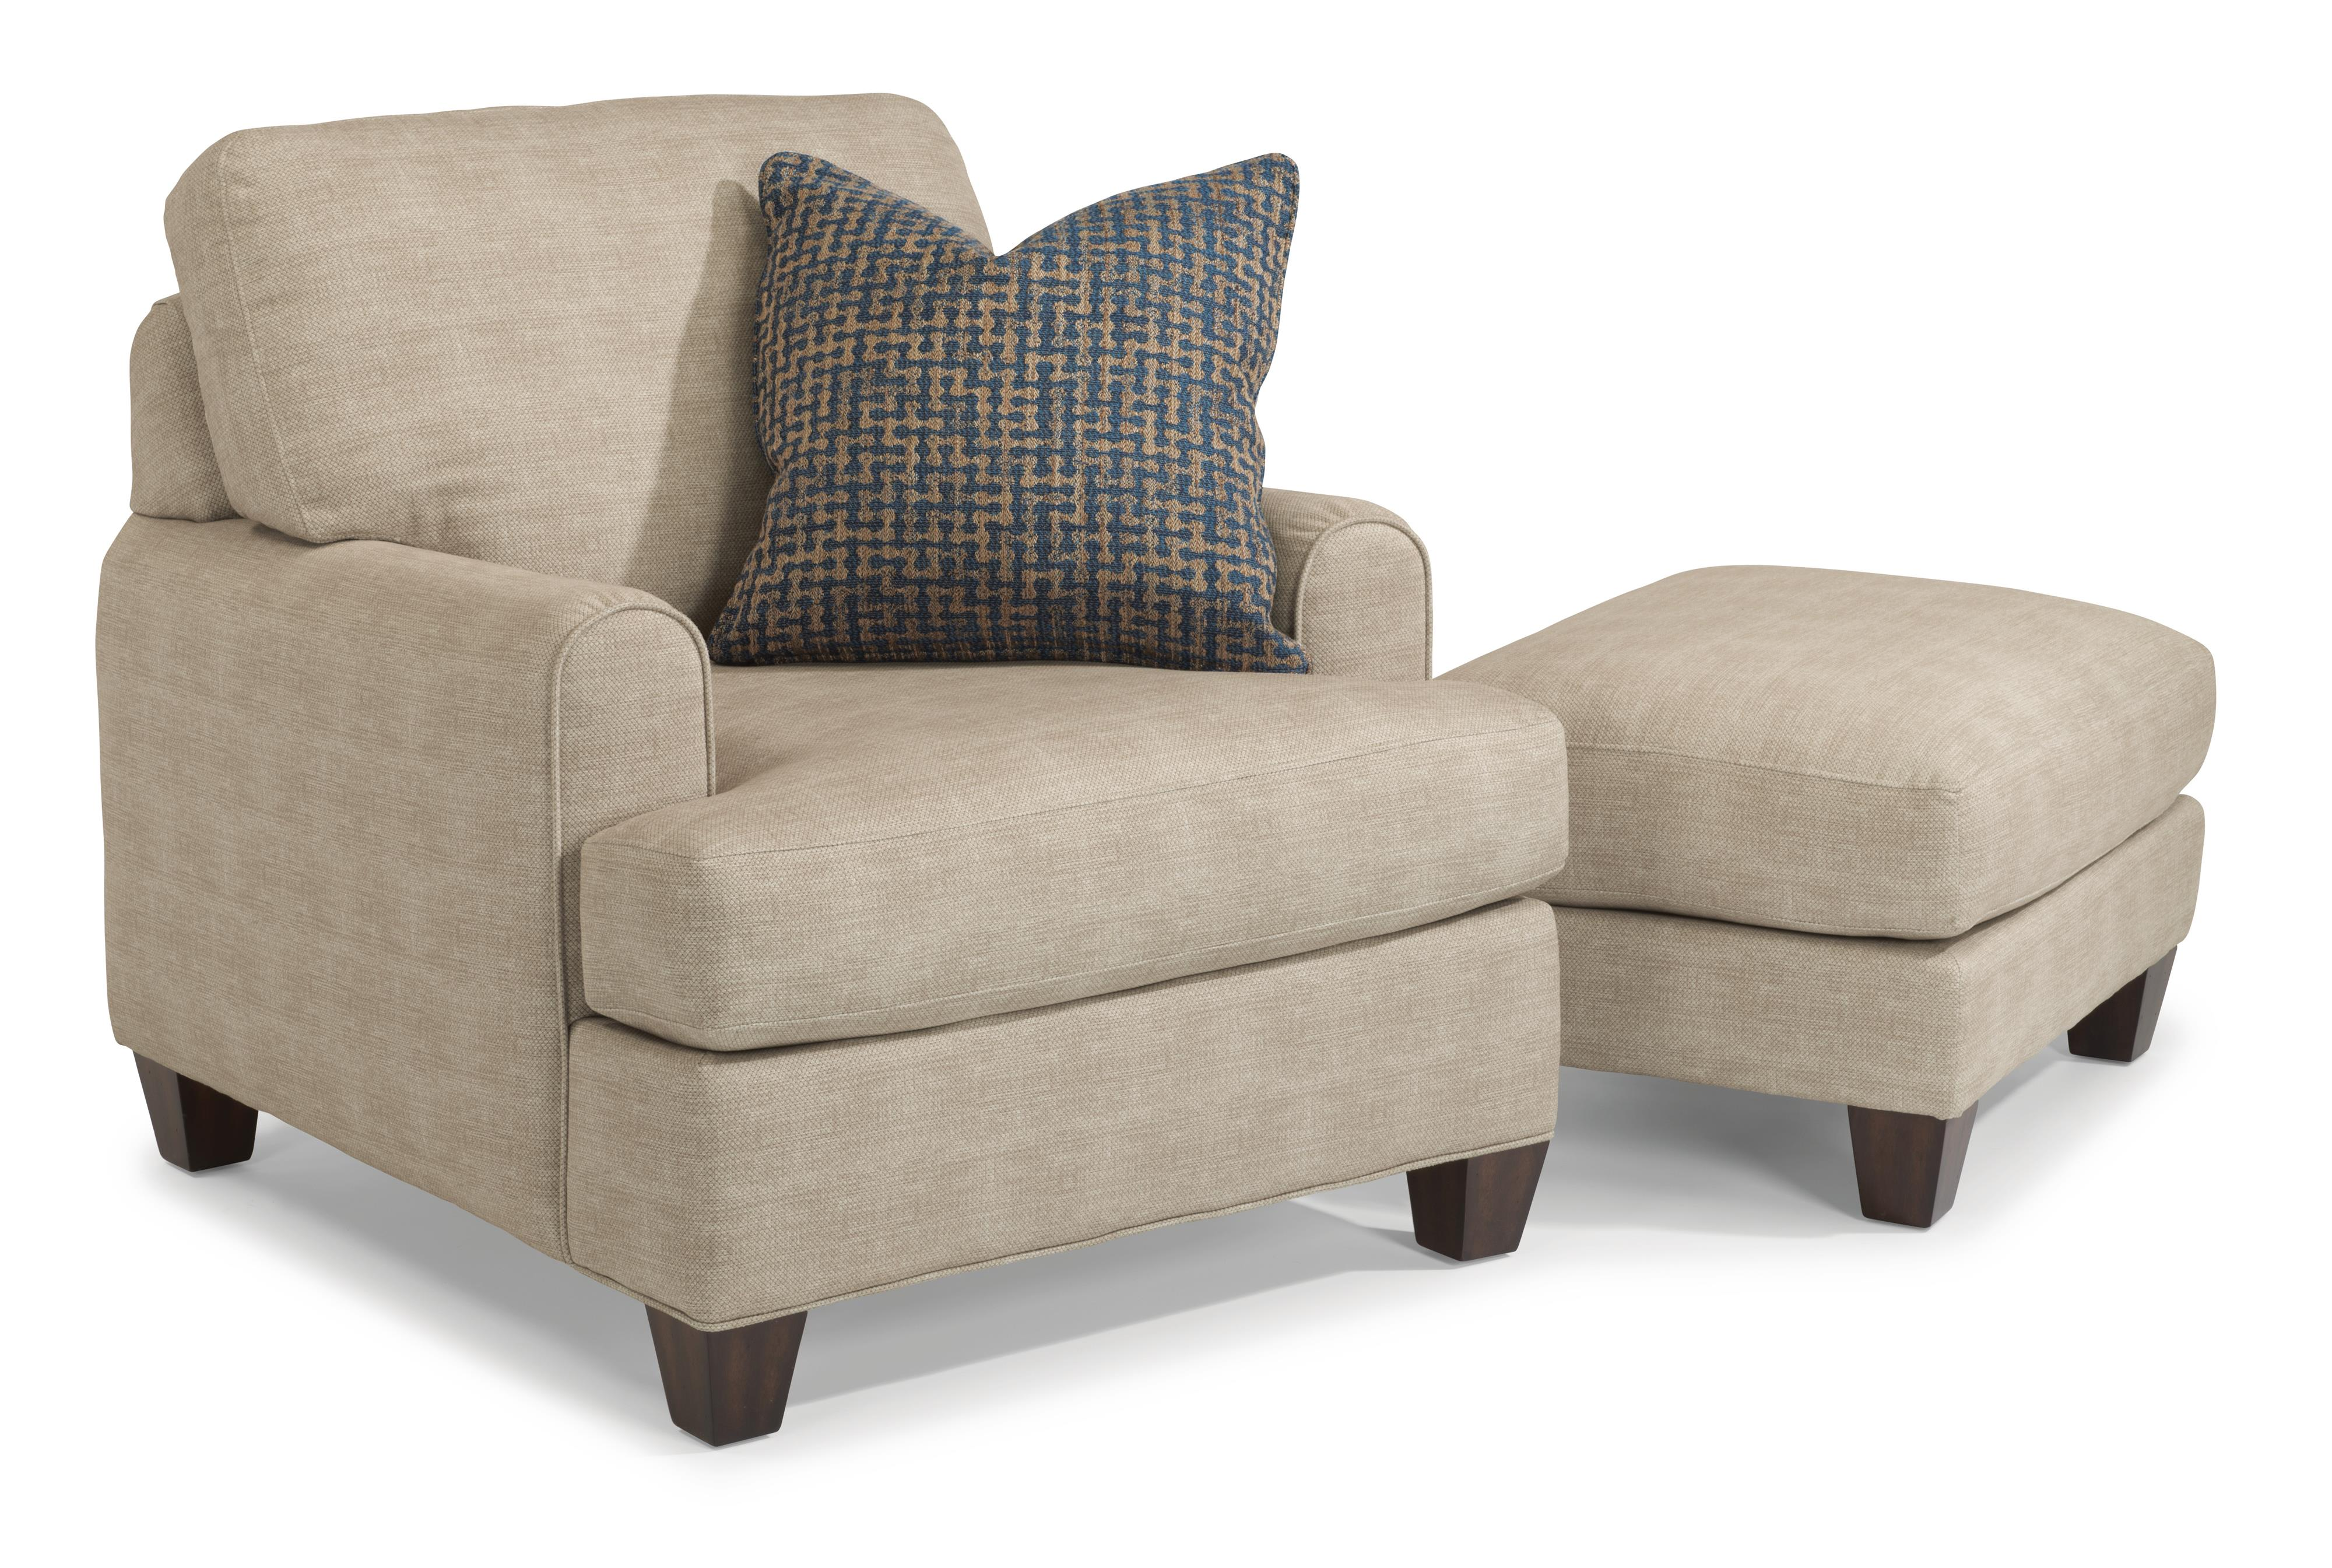 Flexsteel Donatello 5685 Chair & Ottoman Set - Item Number: 5685-10+5685-08-120-80